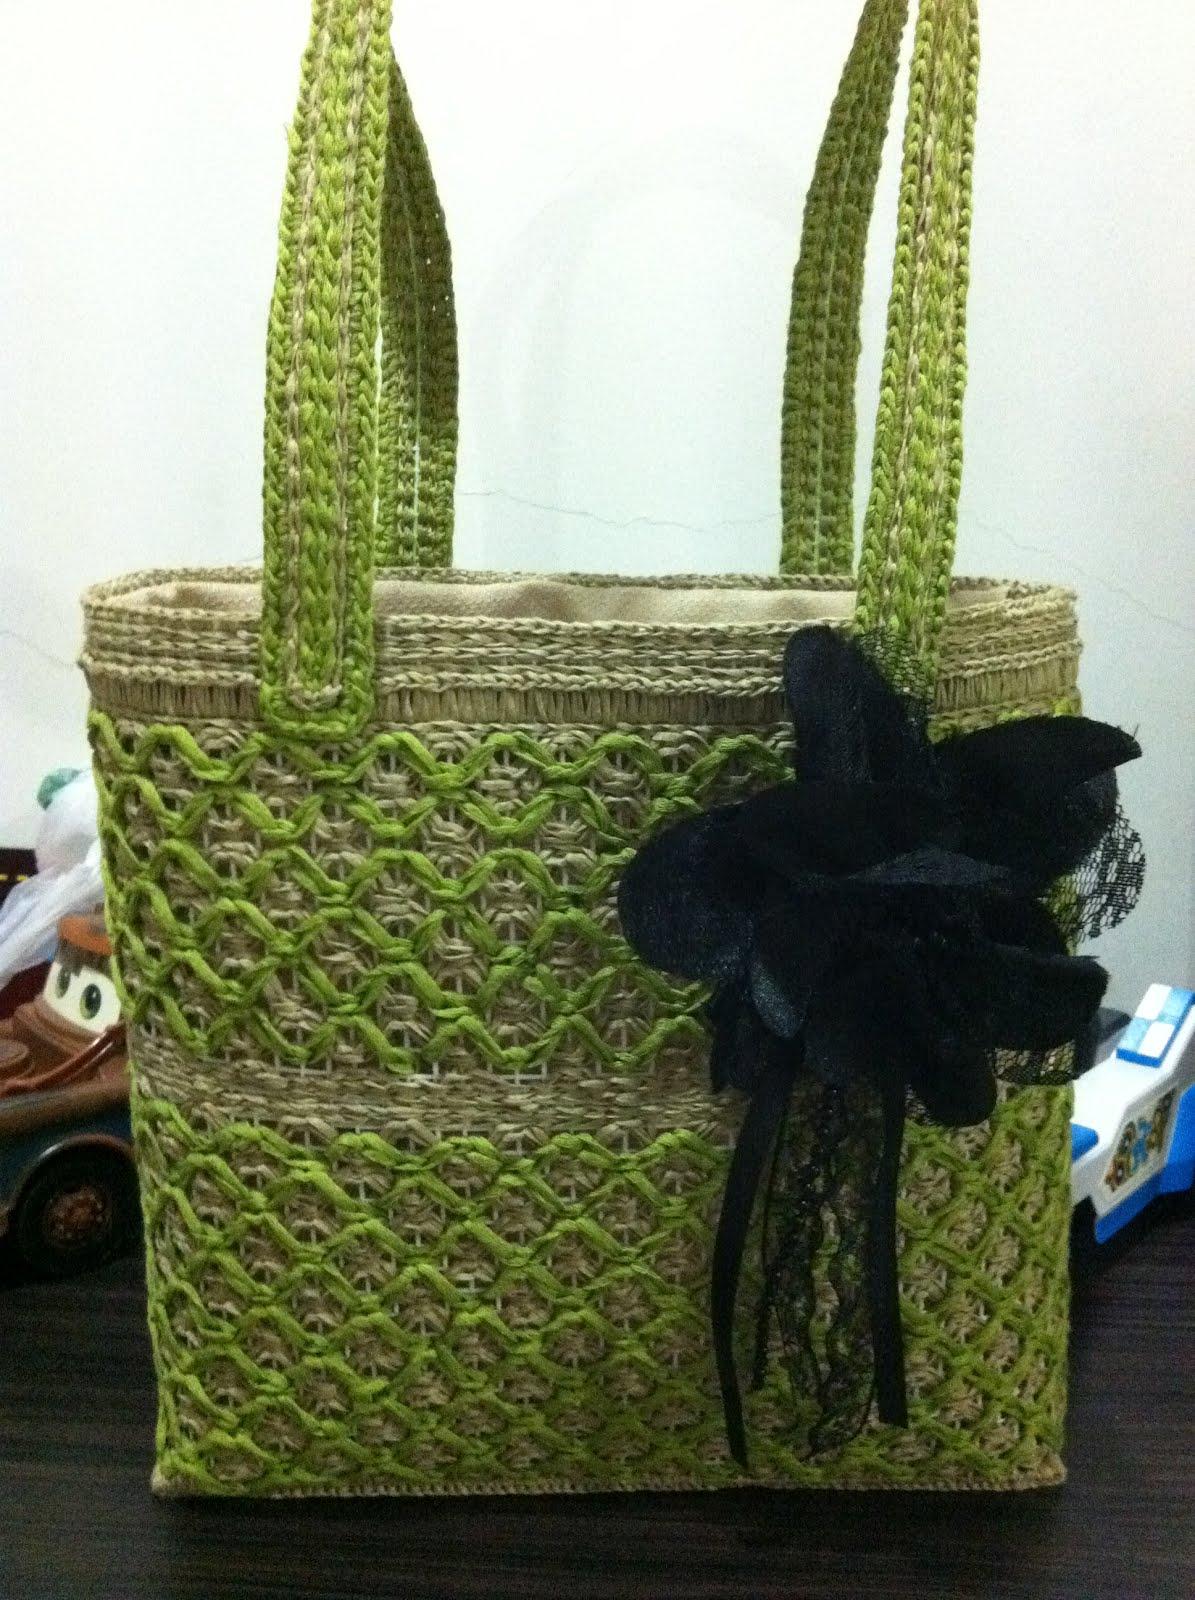 Sling bag crochet - Ec0335 Sling Bag Size 17cm W X 15cm H Rm26 00 Exclude Postage